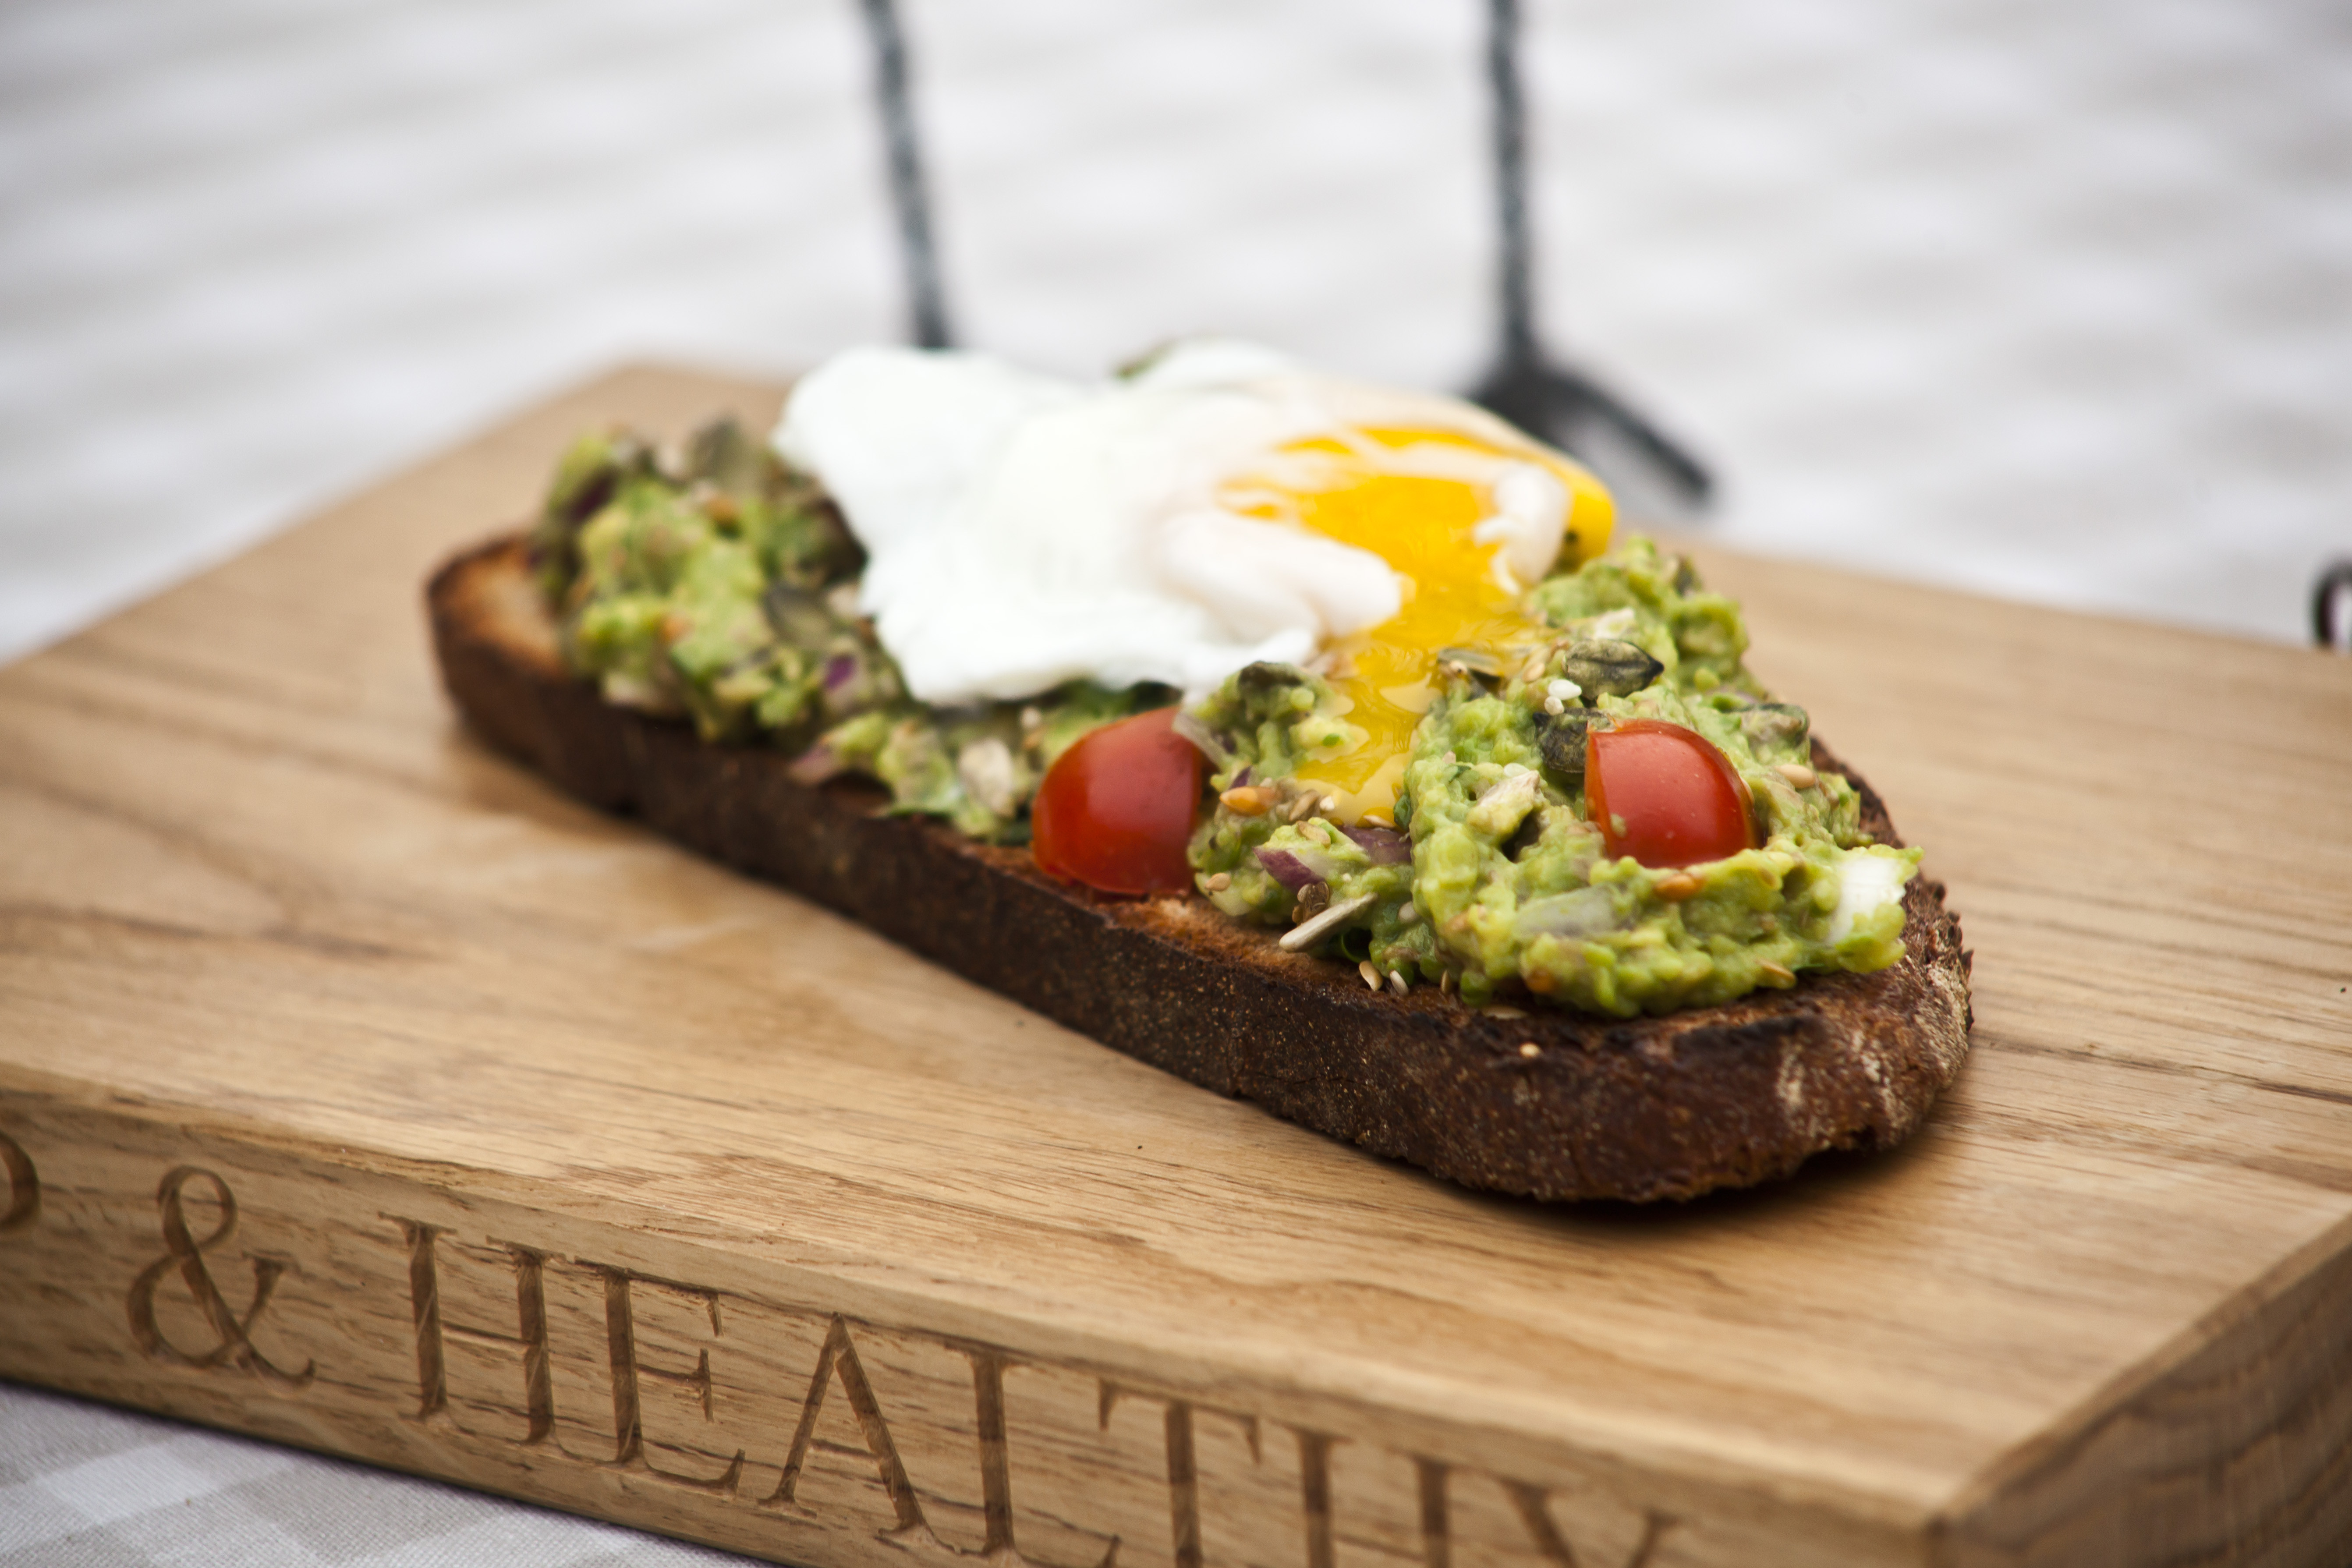 Avocado On Toast Healthy Breakfast  Healthy Breakfast Recipe Eggs and Avocado on Toast Hip